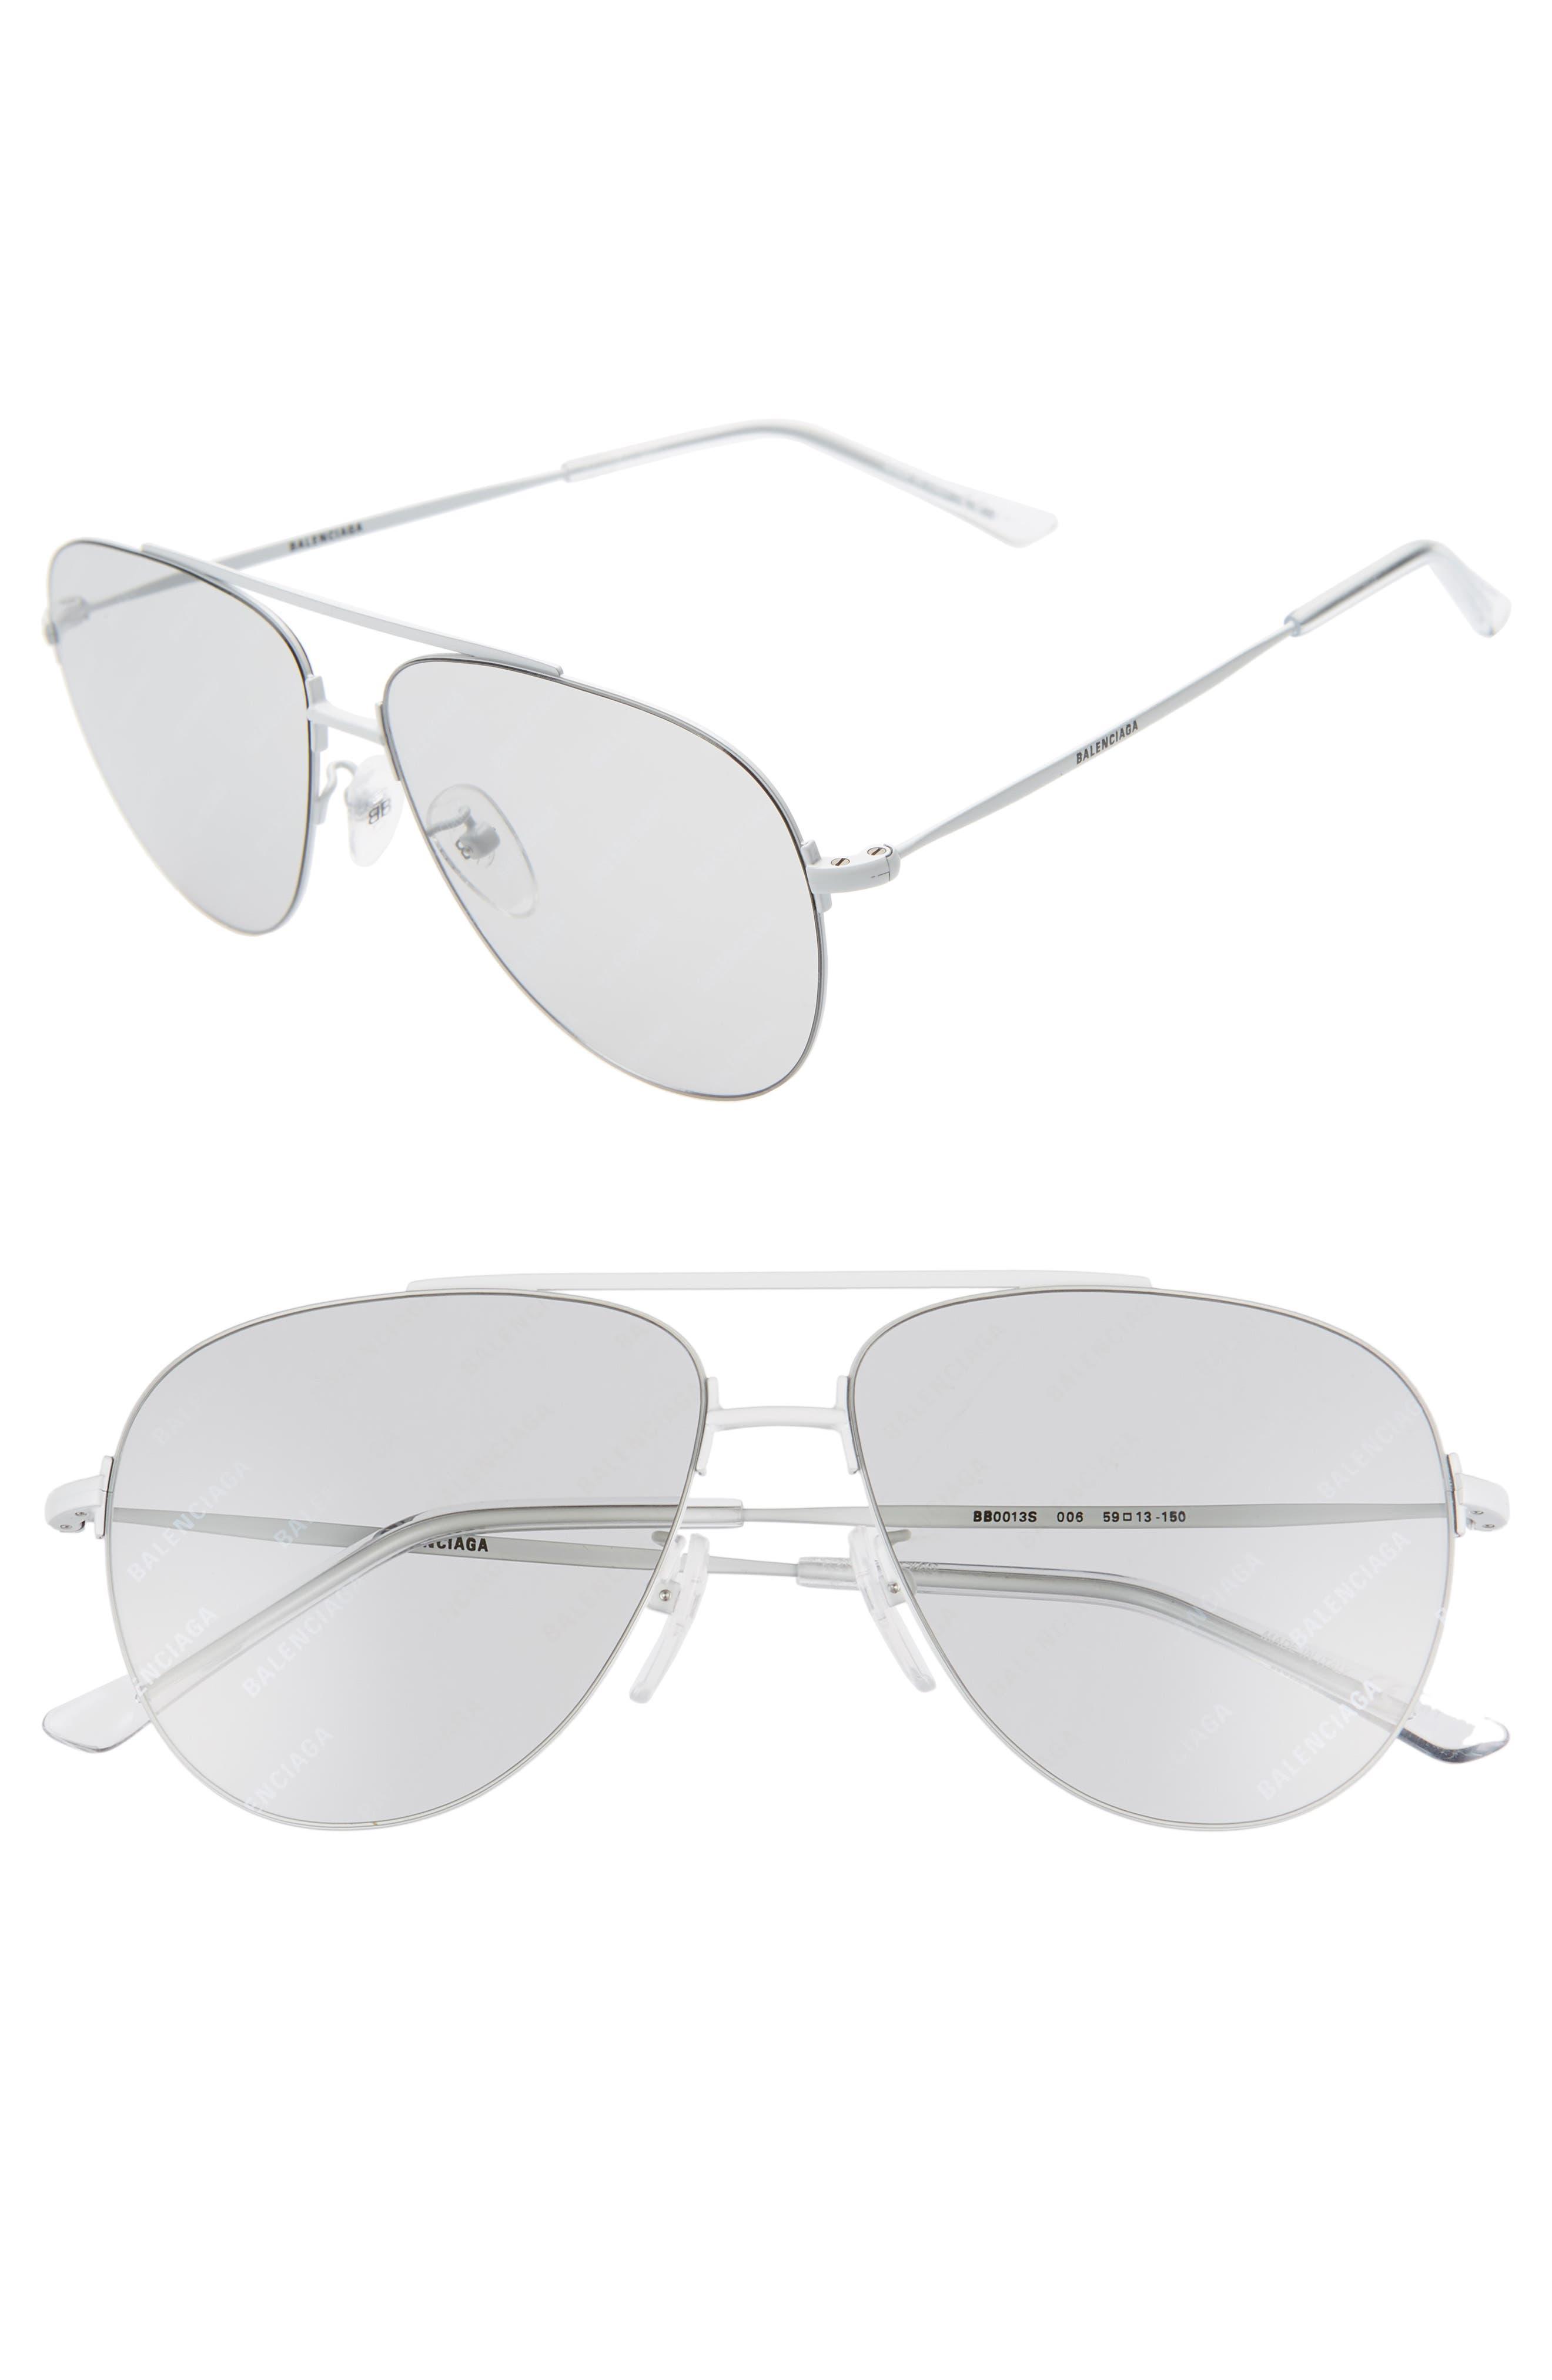 Balenciaga 5m Aviator Sunglasses - Shiny Solid White/ Grey